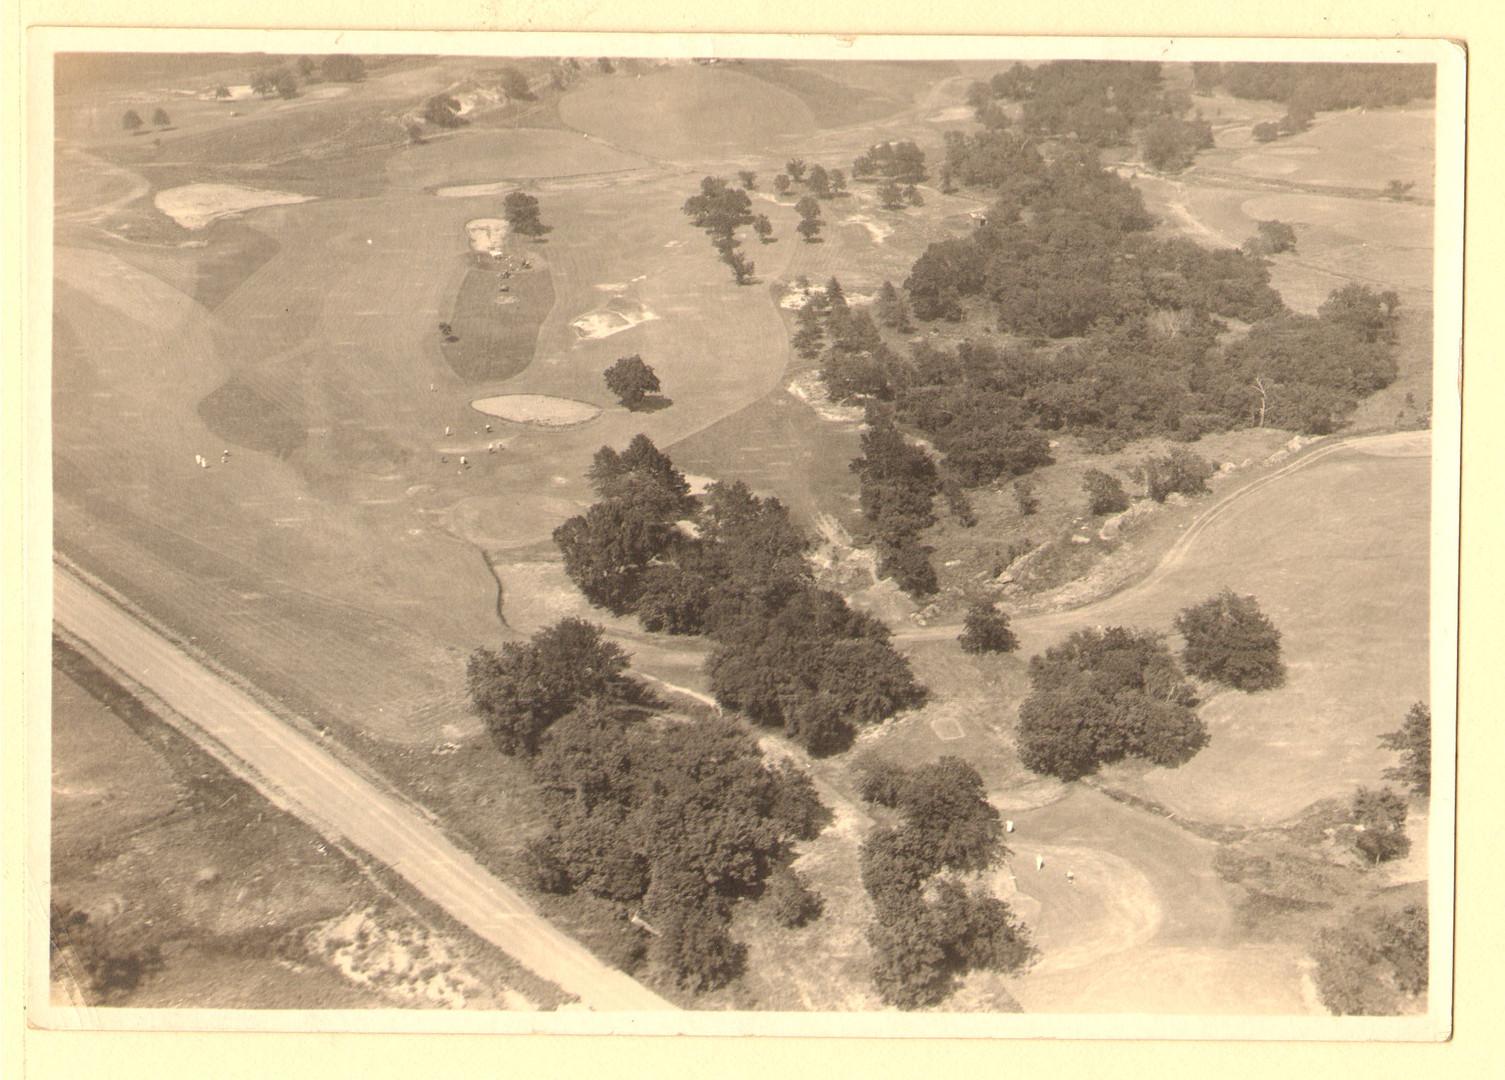 Aerial Dornick #12, 13 & 15 Unknown Date